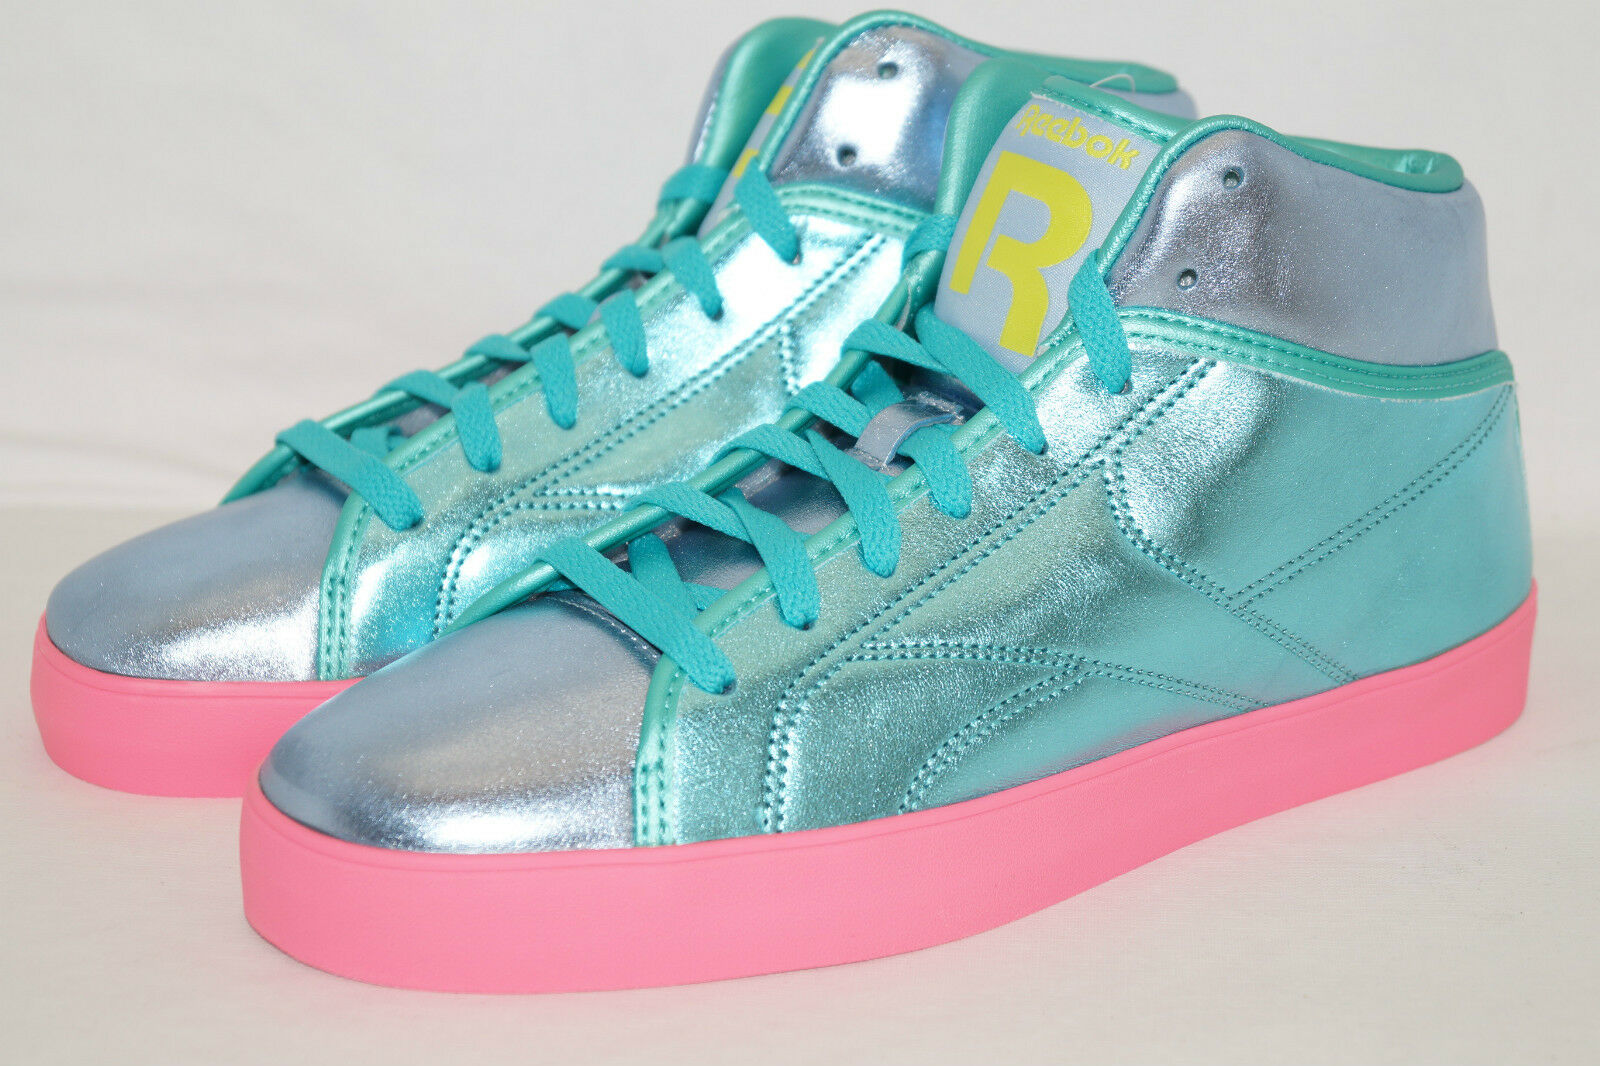 REEBOK T-RAWW WMNS Sneakers Gr.37,5 UK 5 Emerald/solar green pink Metal look